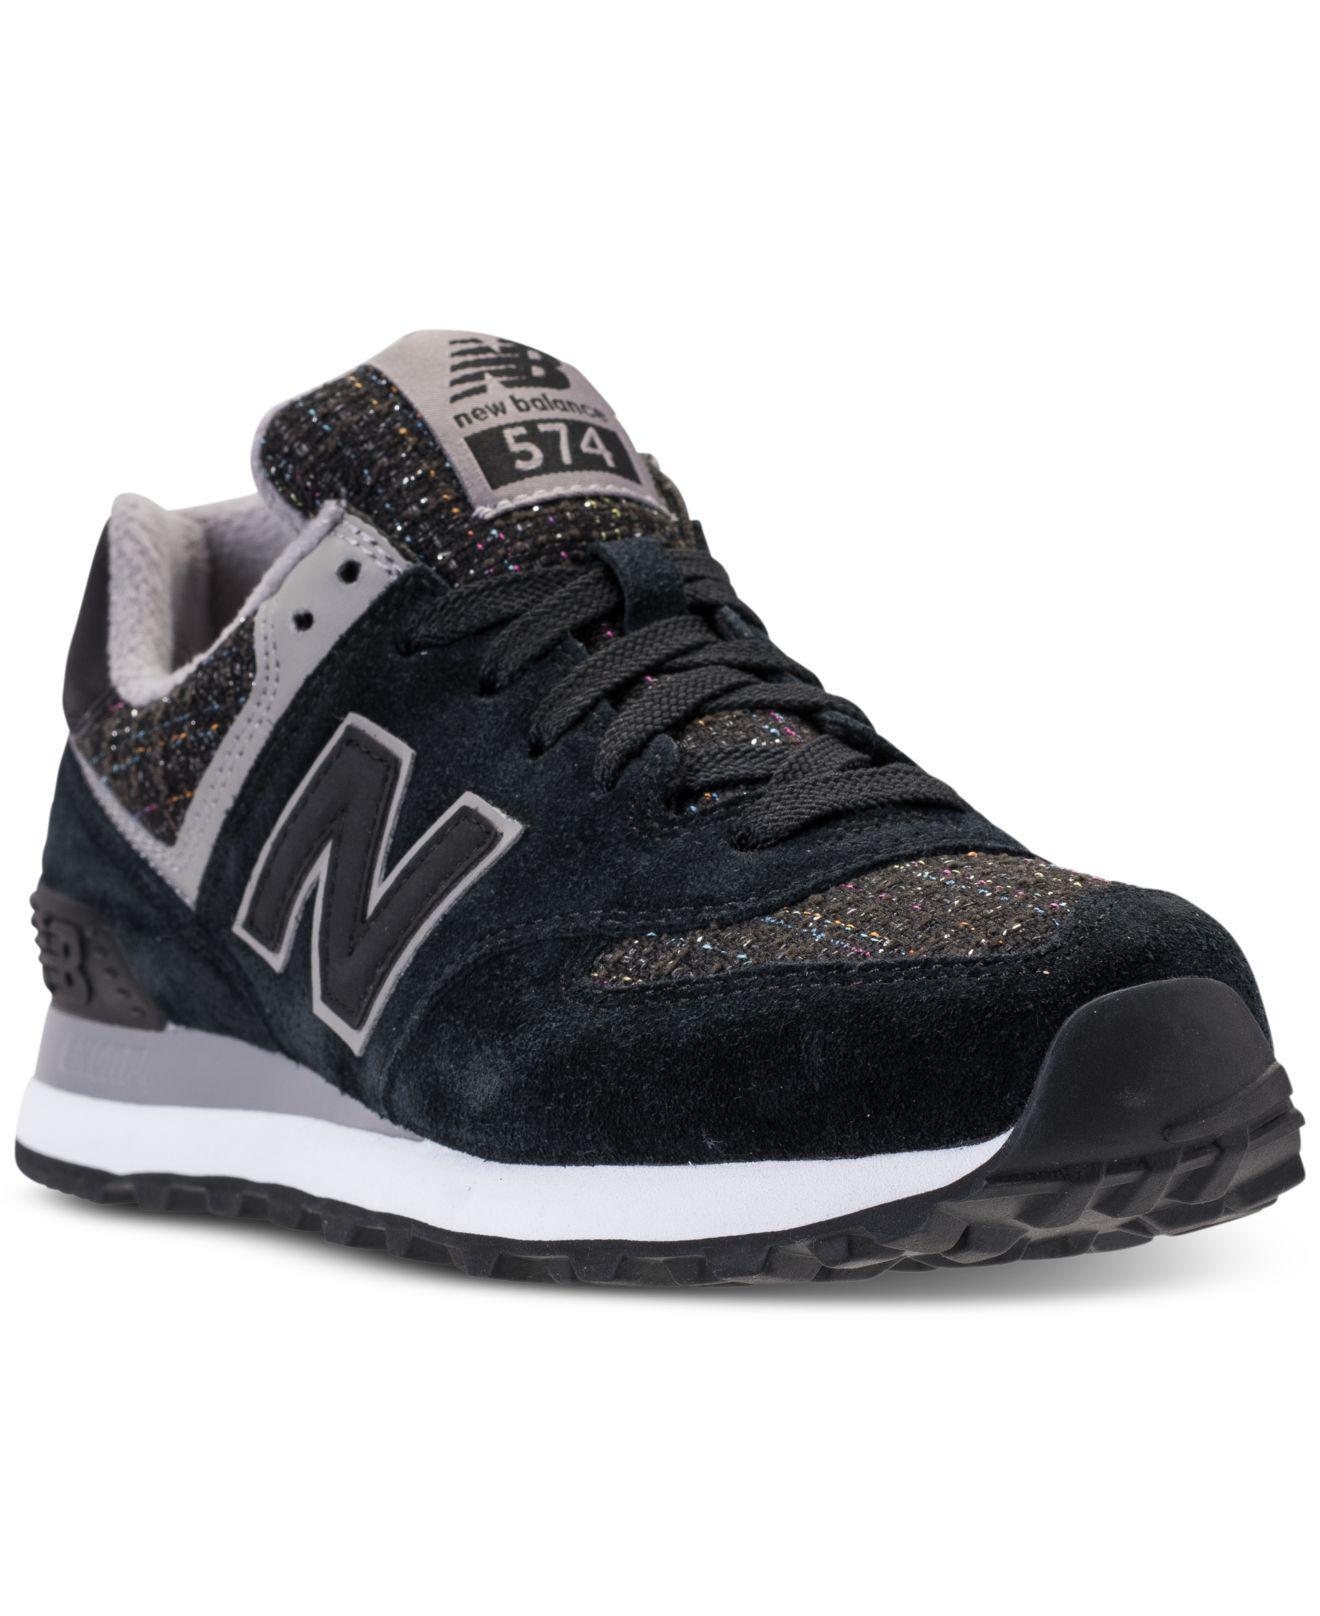 women's new balance 574 athletic shoe black monochrome